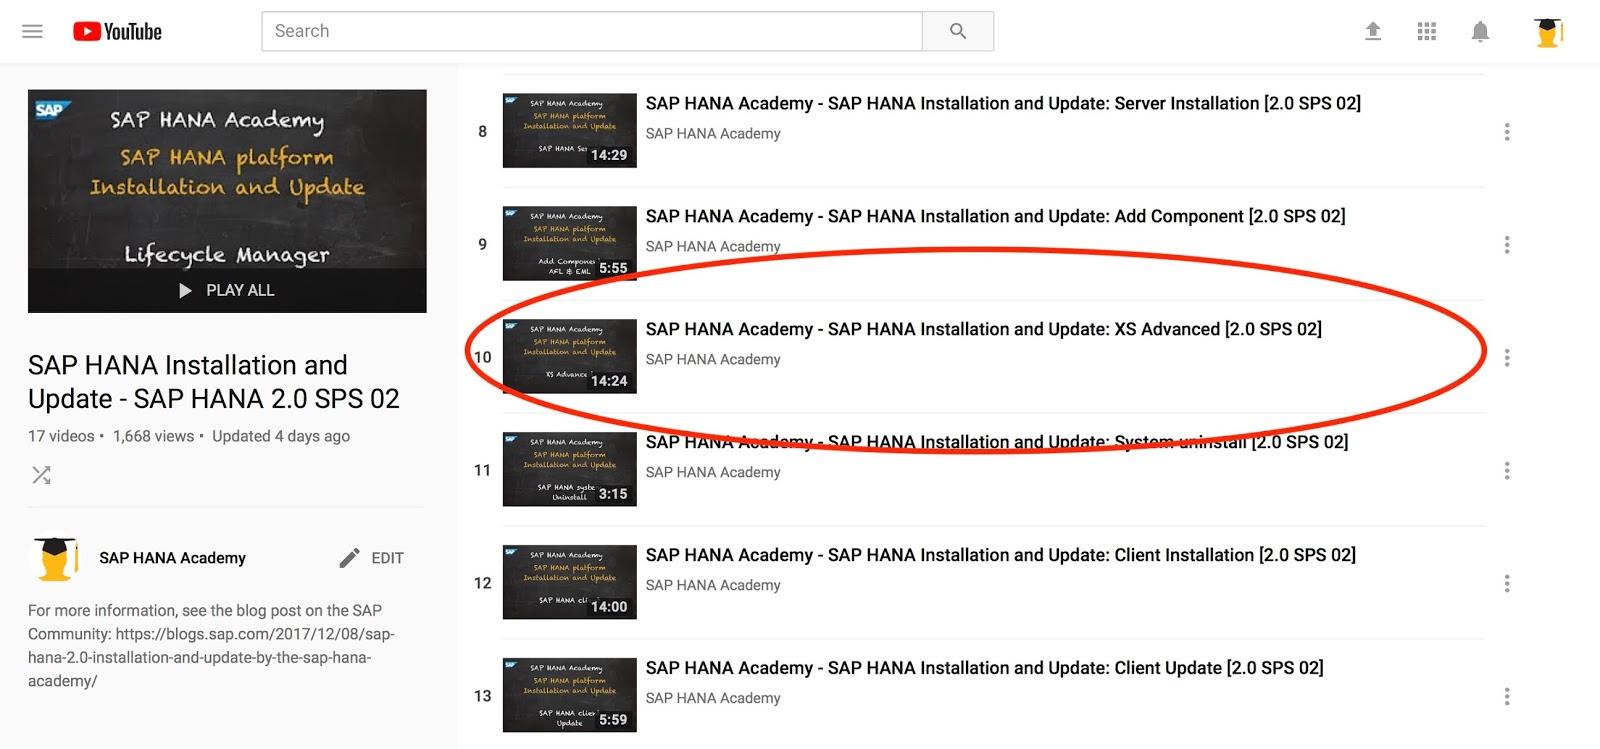 Sap hana tutorial material and certification guide sap hana 20 sap hana guides sap hana tutorials and materials sap hana baditri Image collections